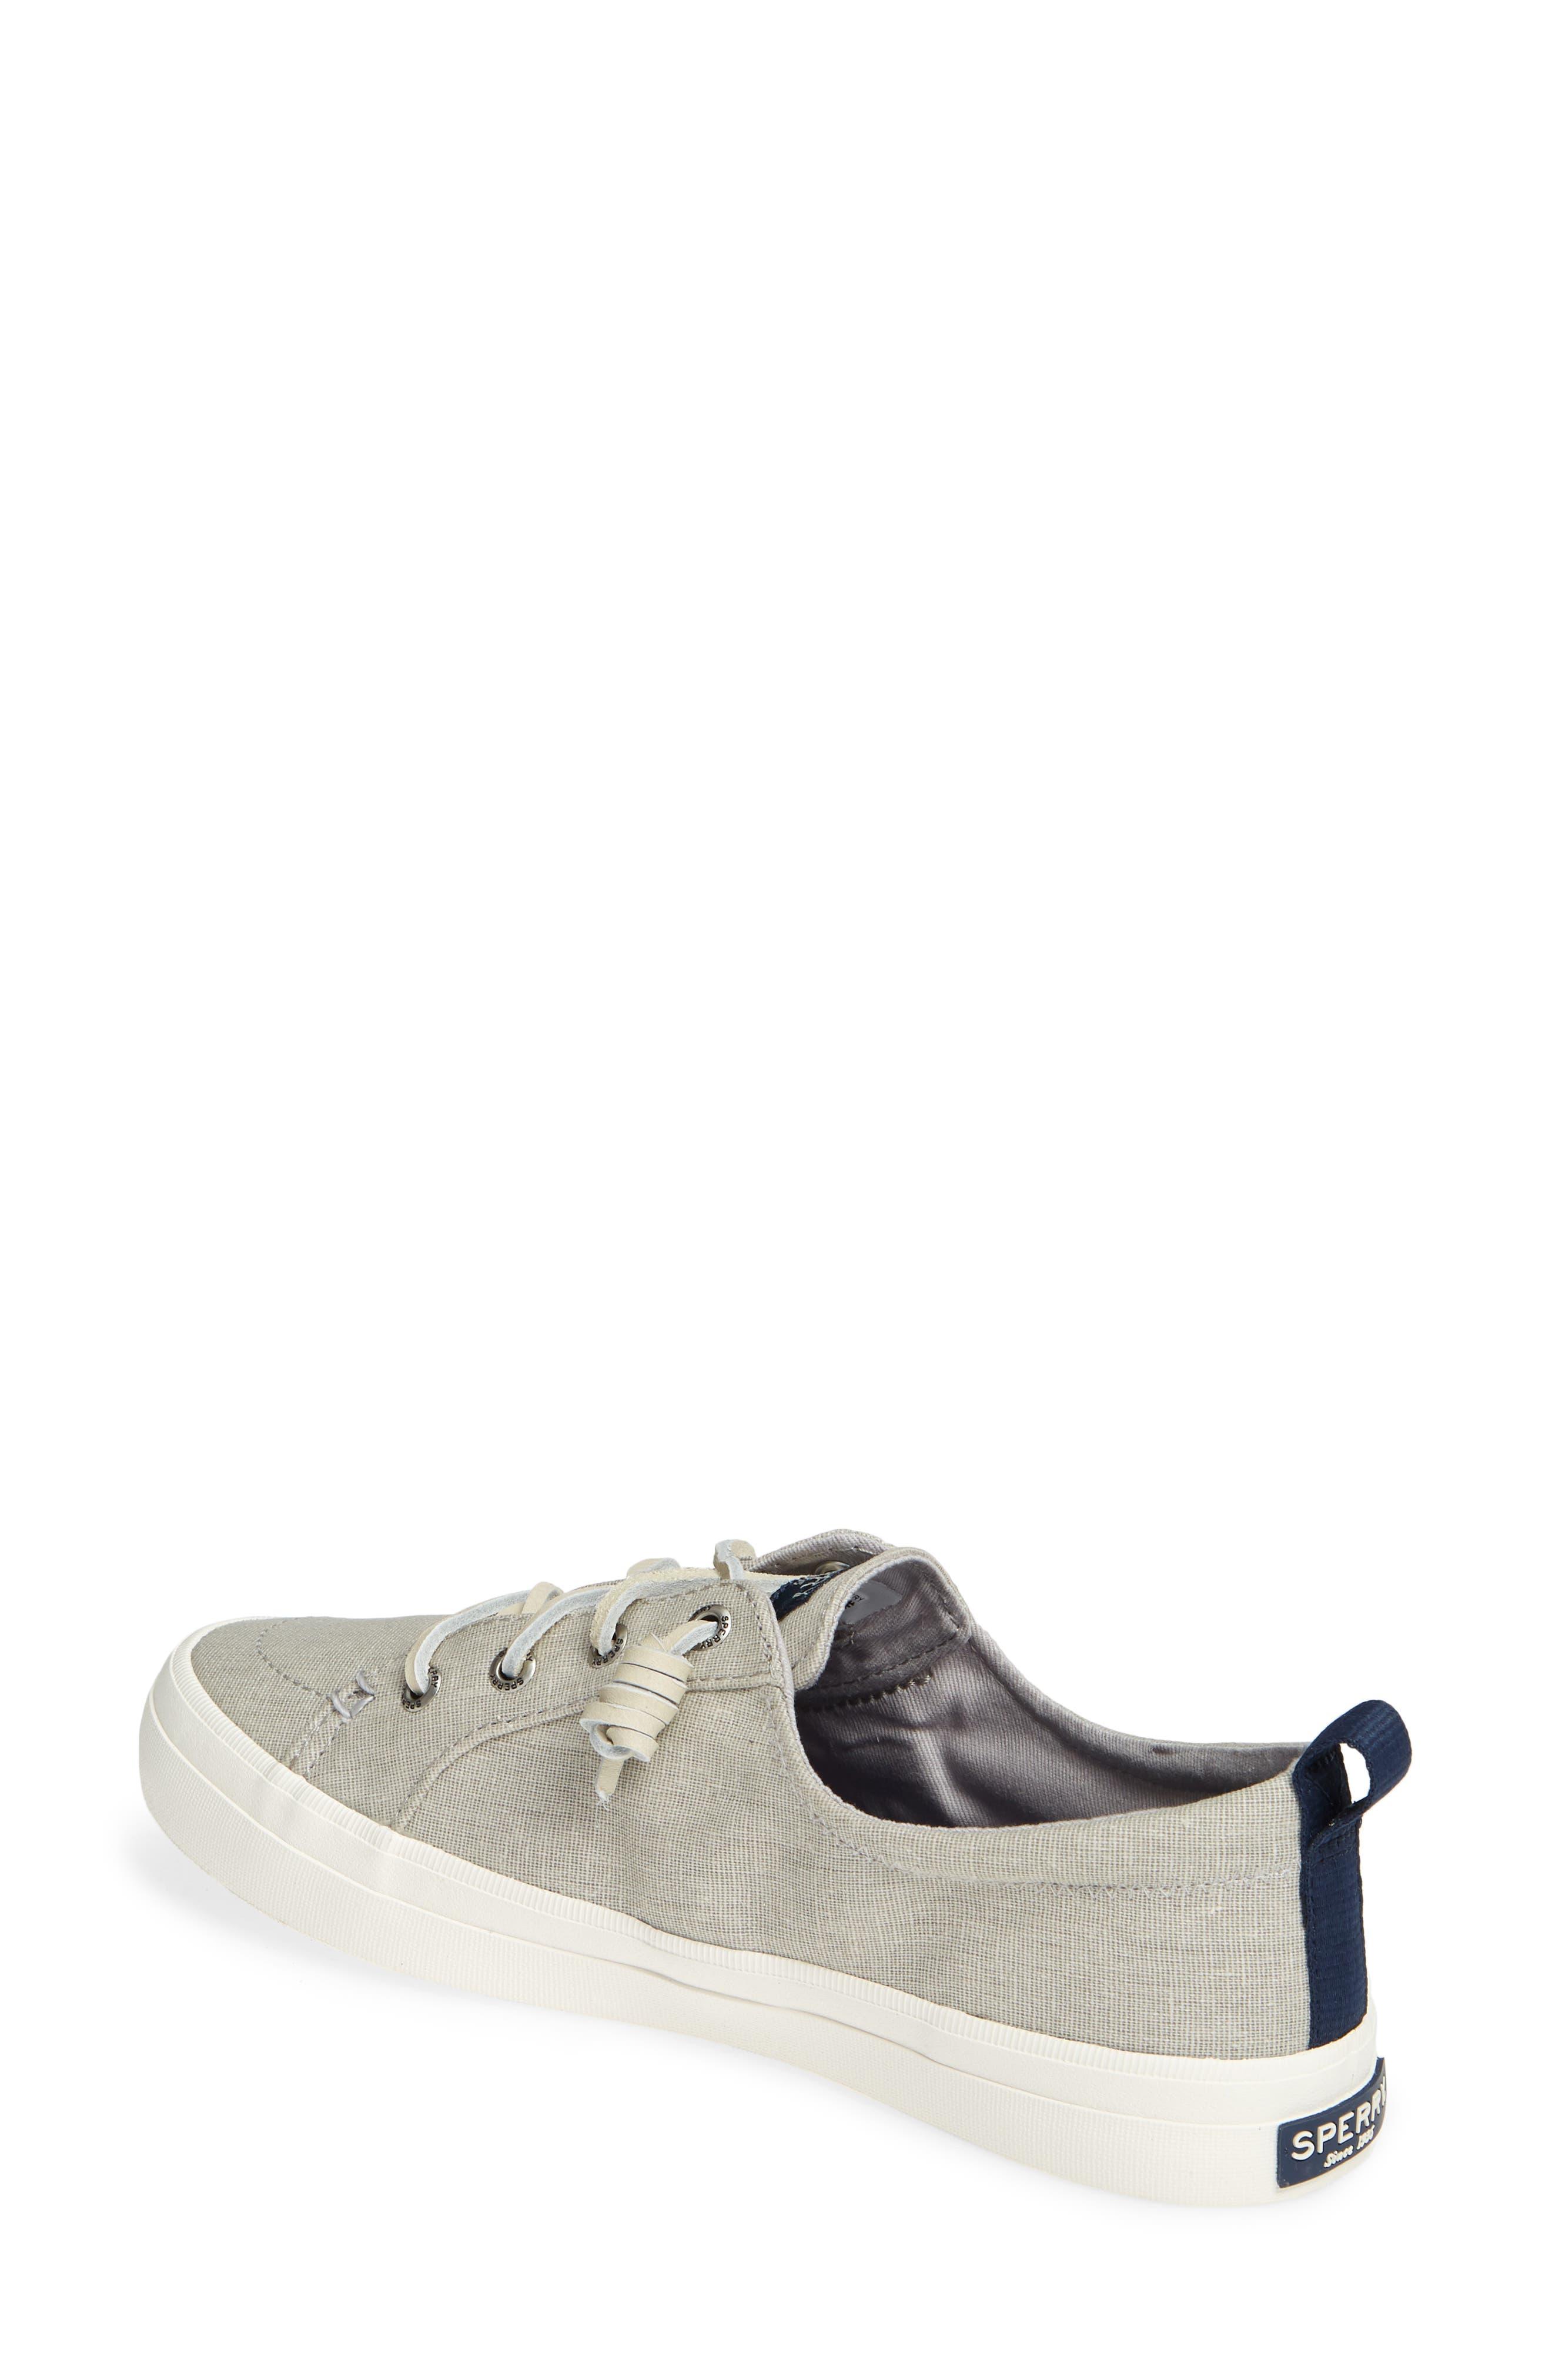 SPERRY, Crest Vibe Sneaker, Alternate thumbnail 2, color, GREY LINEN FABRIC